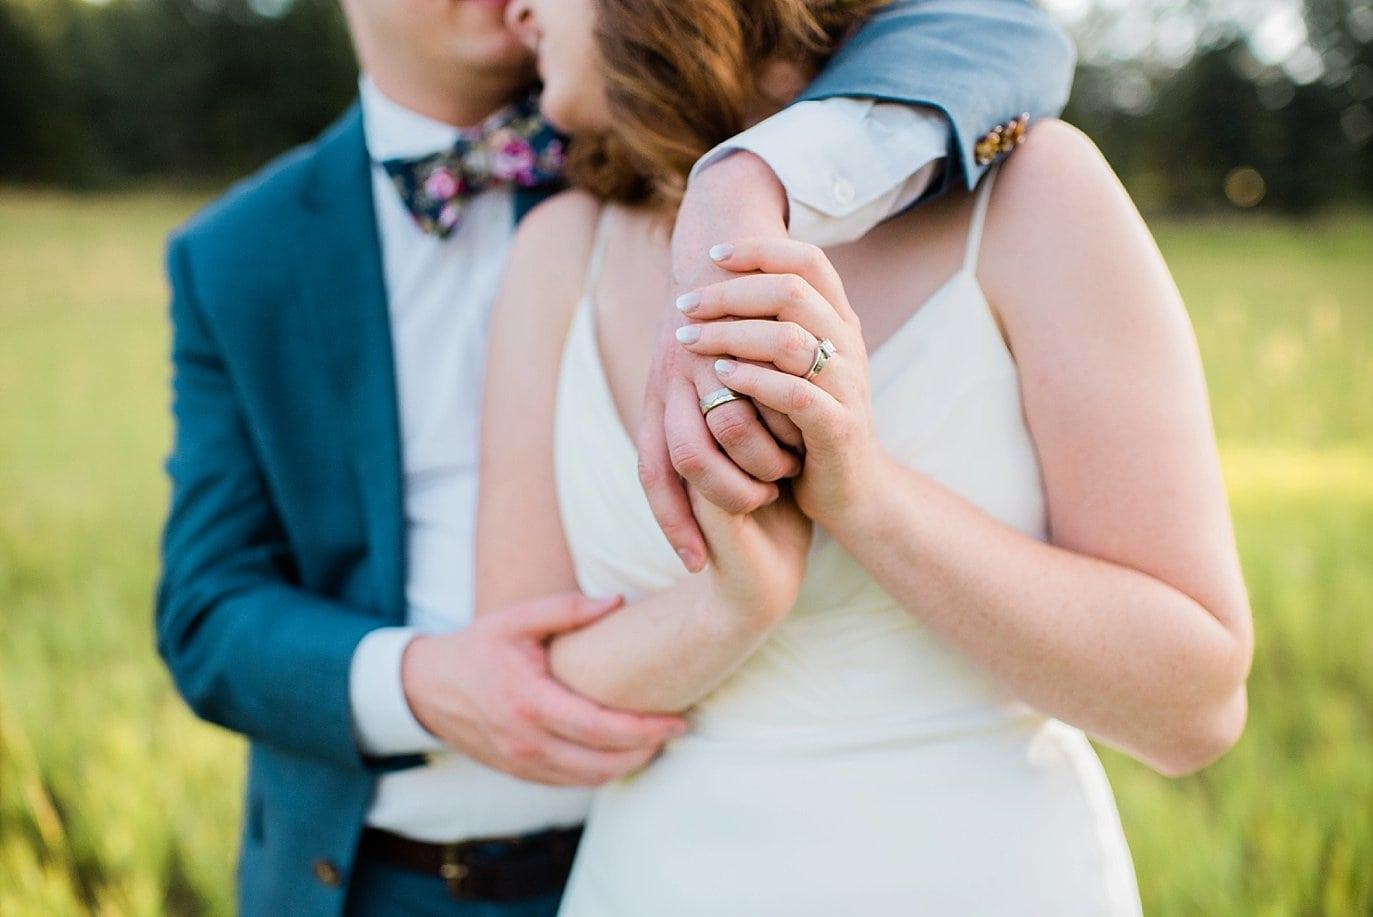 cronin jewelry wedding rings photo